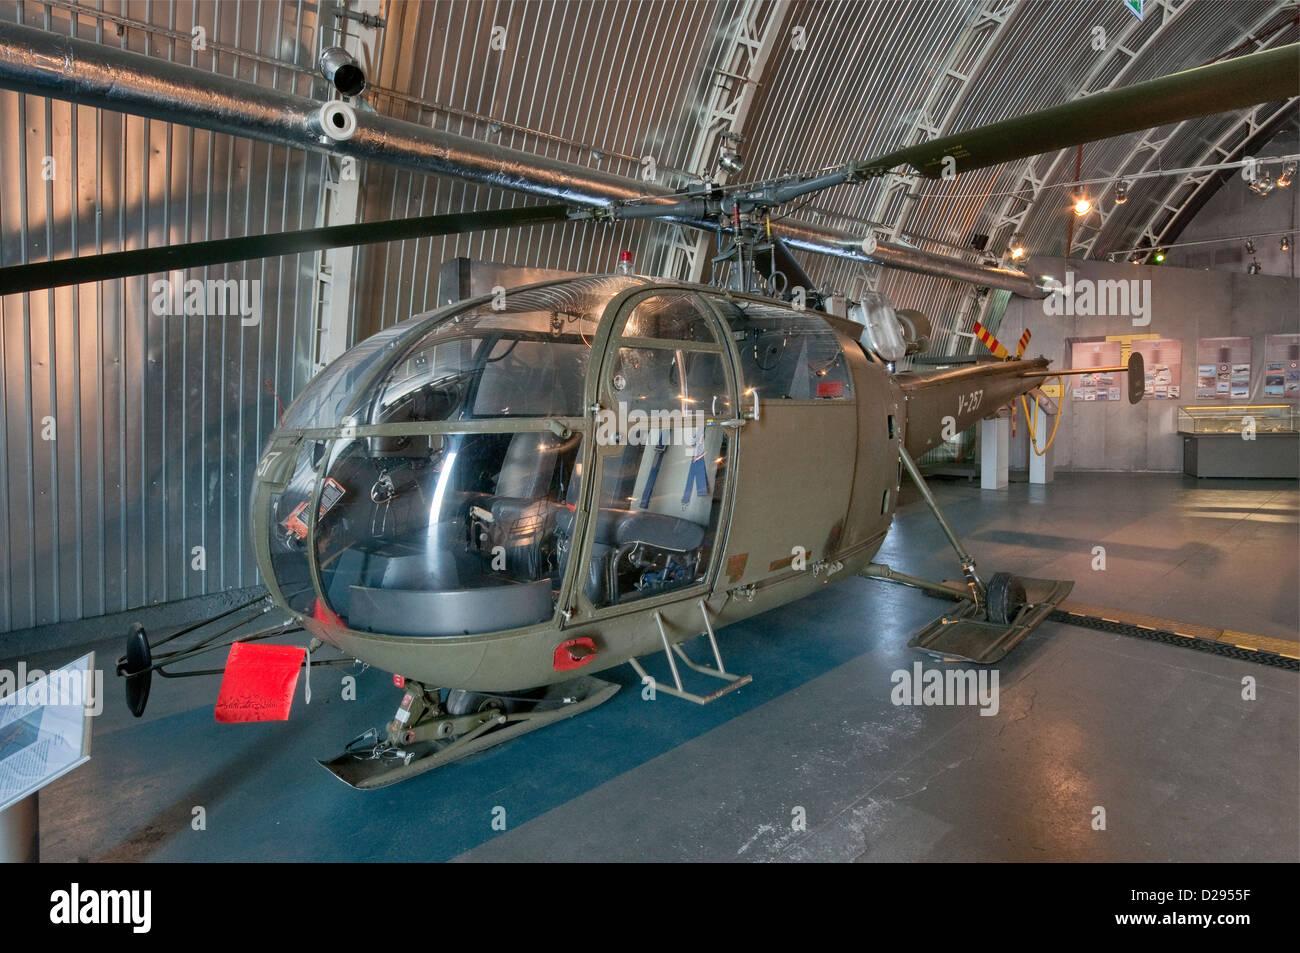 Sud-Aviation SE-3160 Alouette III multipurpose helicopter, Polish Aviation Museum in Krakow, Poland - Stock Image